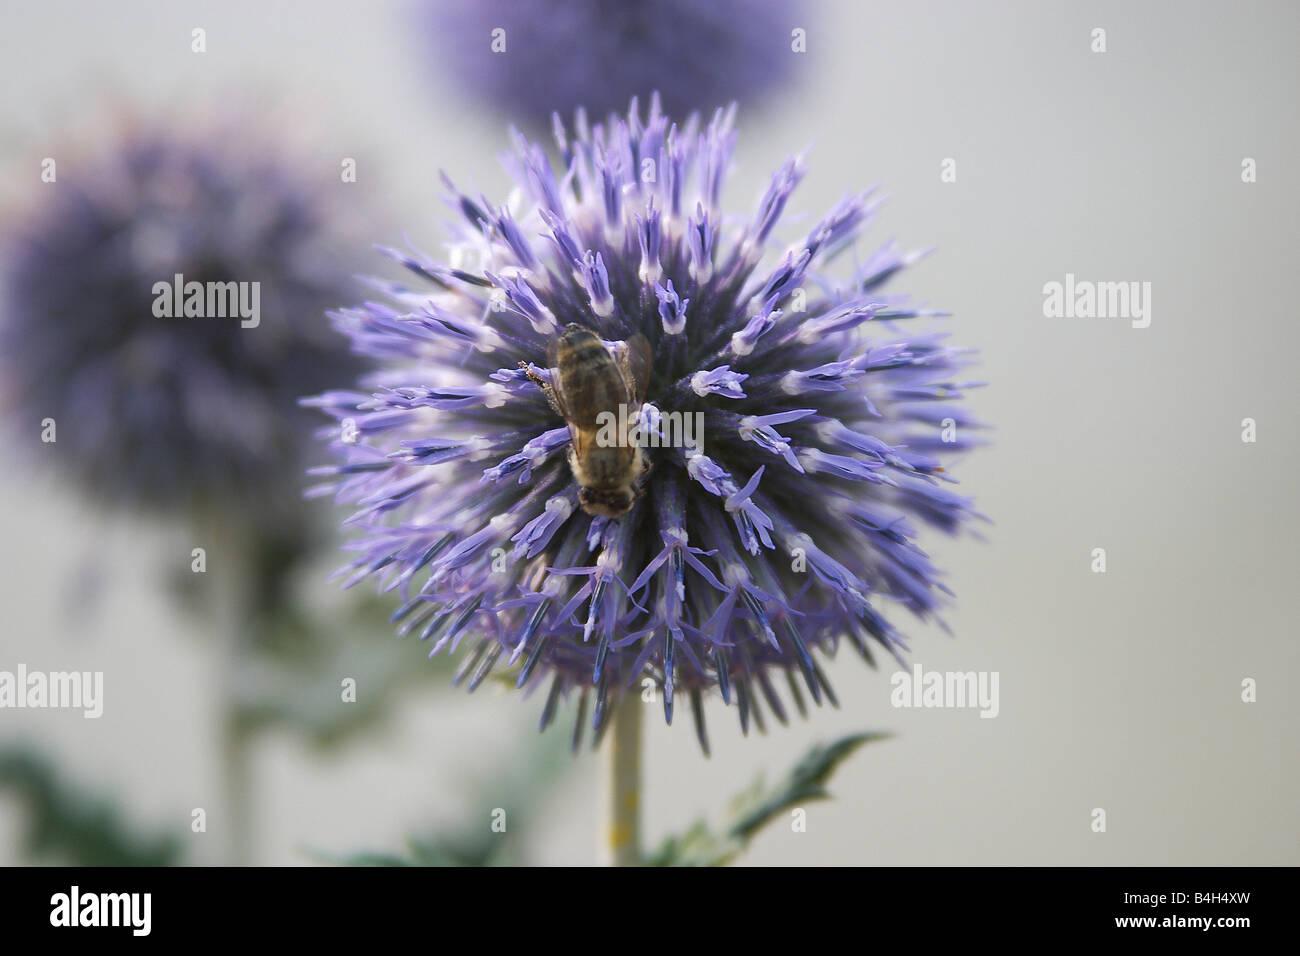 Close-up of honeybee pollinating flower Stock Photo